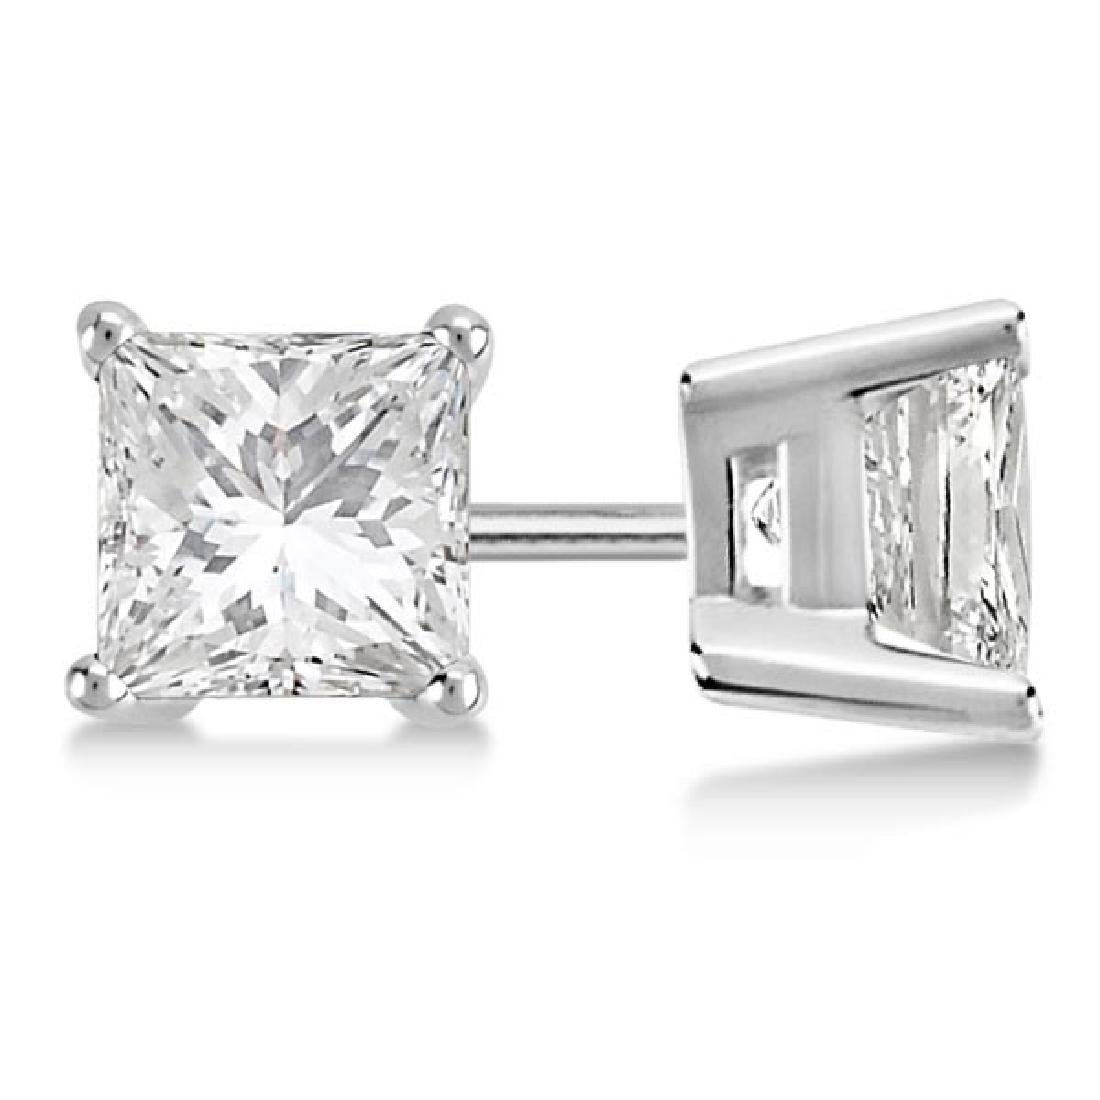 Certified 1.21 CTW Princess Diamond Stud Earrings H/SI2